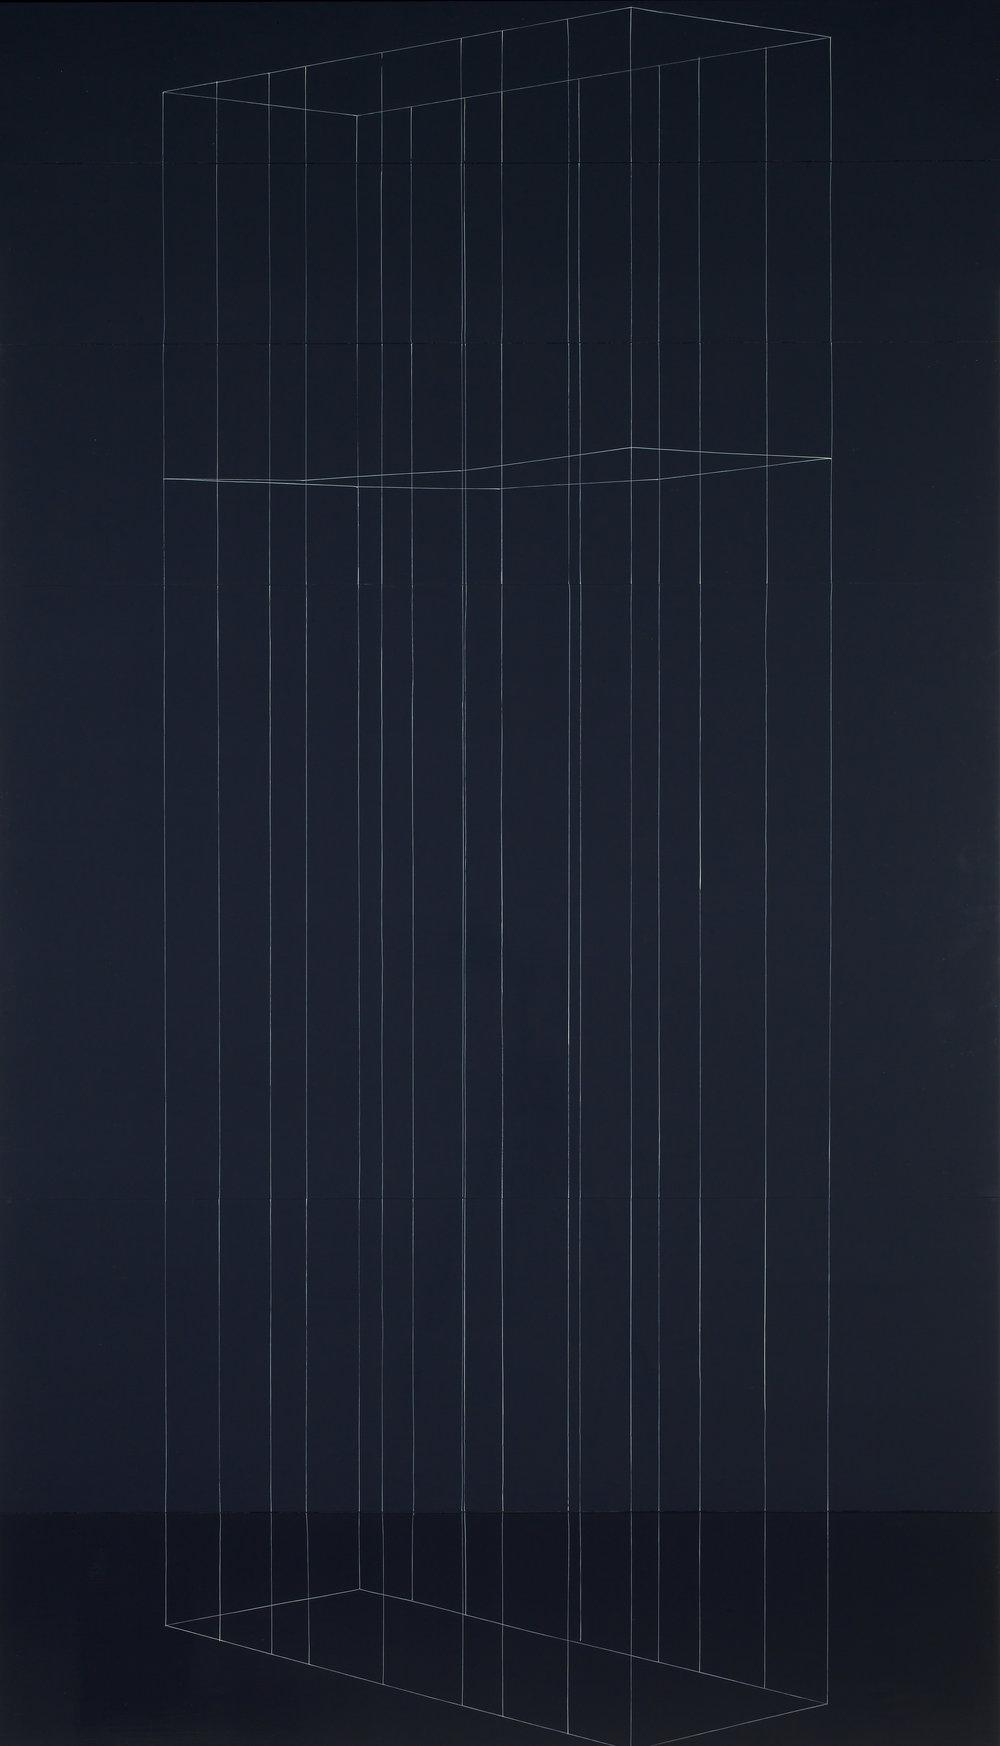 Kate Shepherd, 2003_Tall Black Cage with One Sagging Shelf.jpg